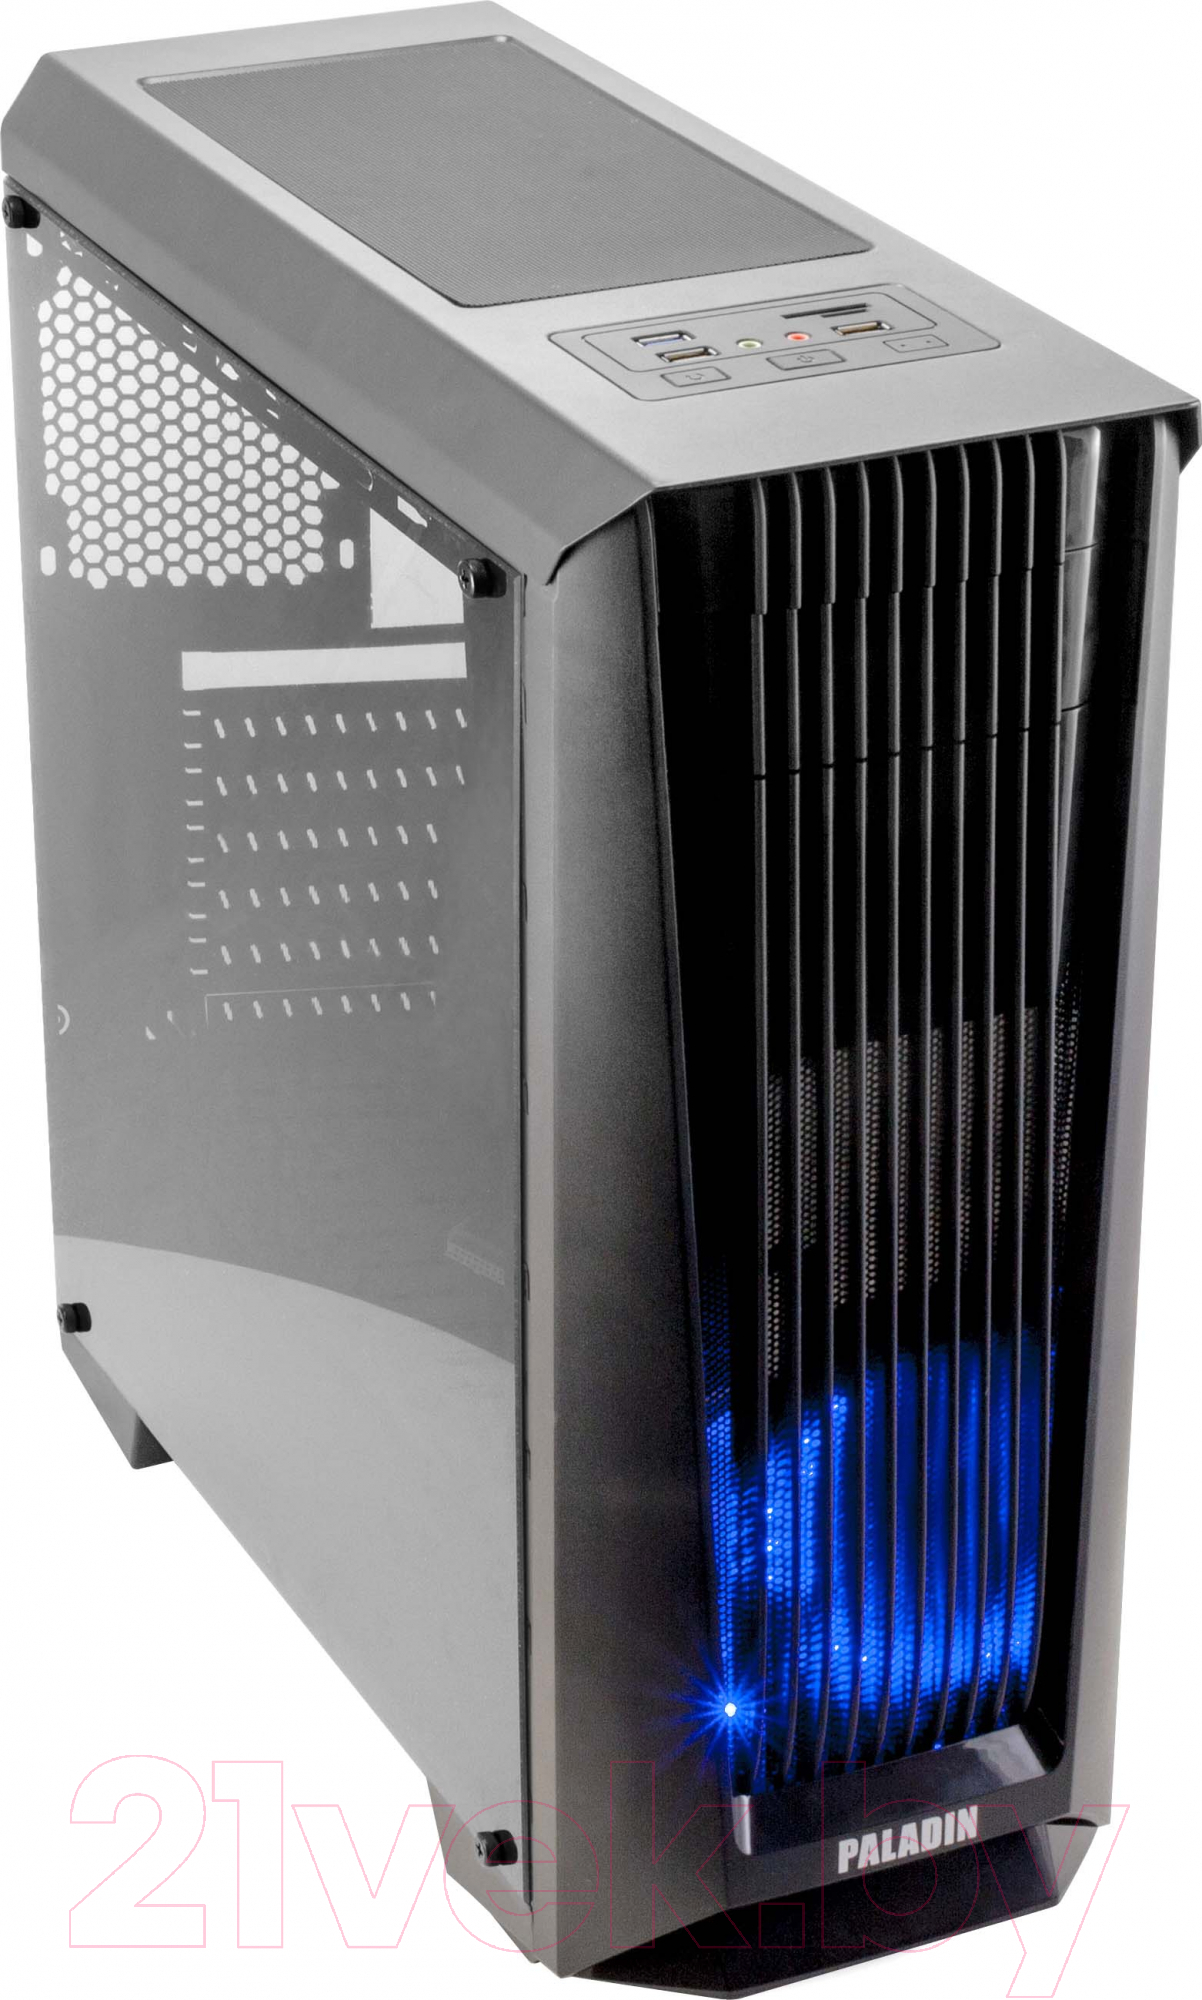 Купить Системный блок Z-Tech, I5-96K-8-120-1000-310-N-90021n, Беларусь